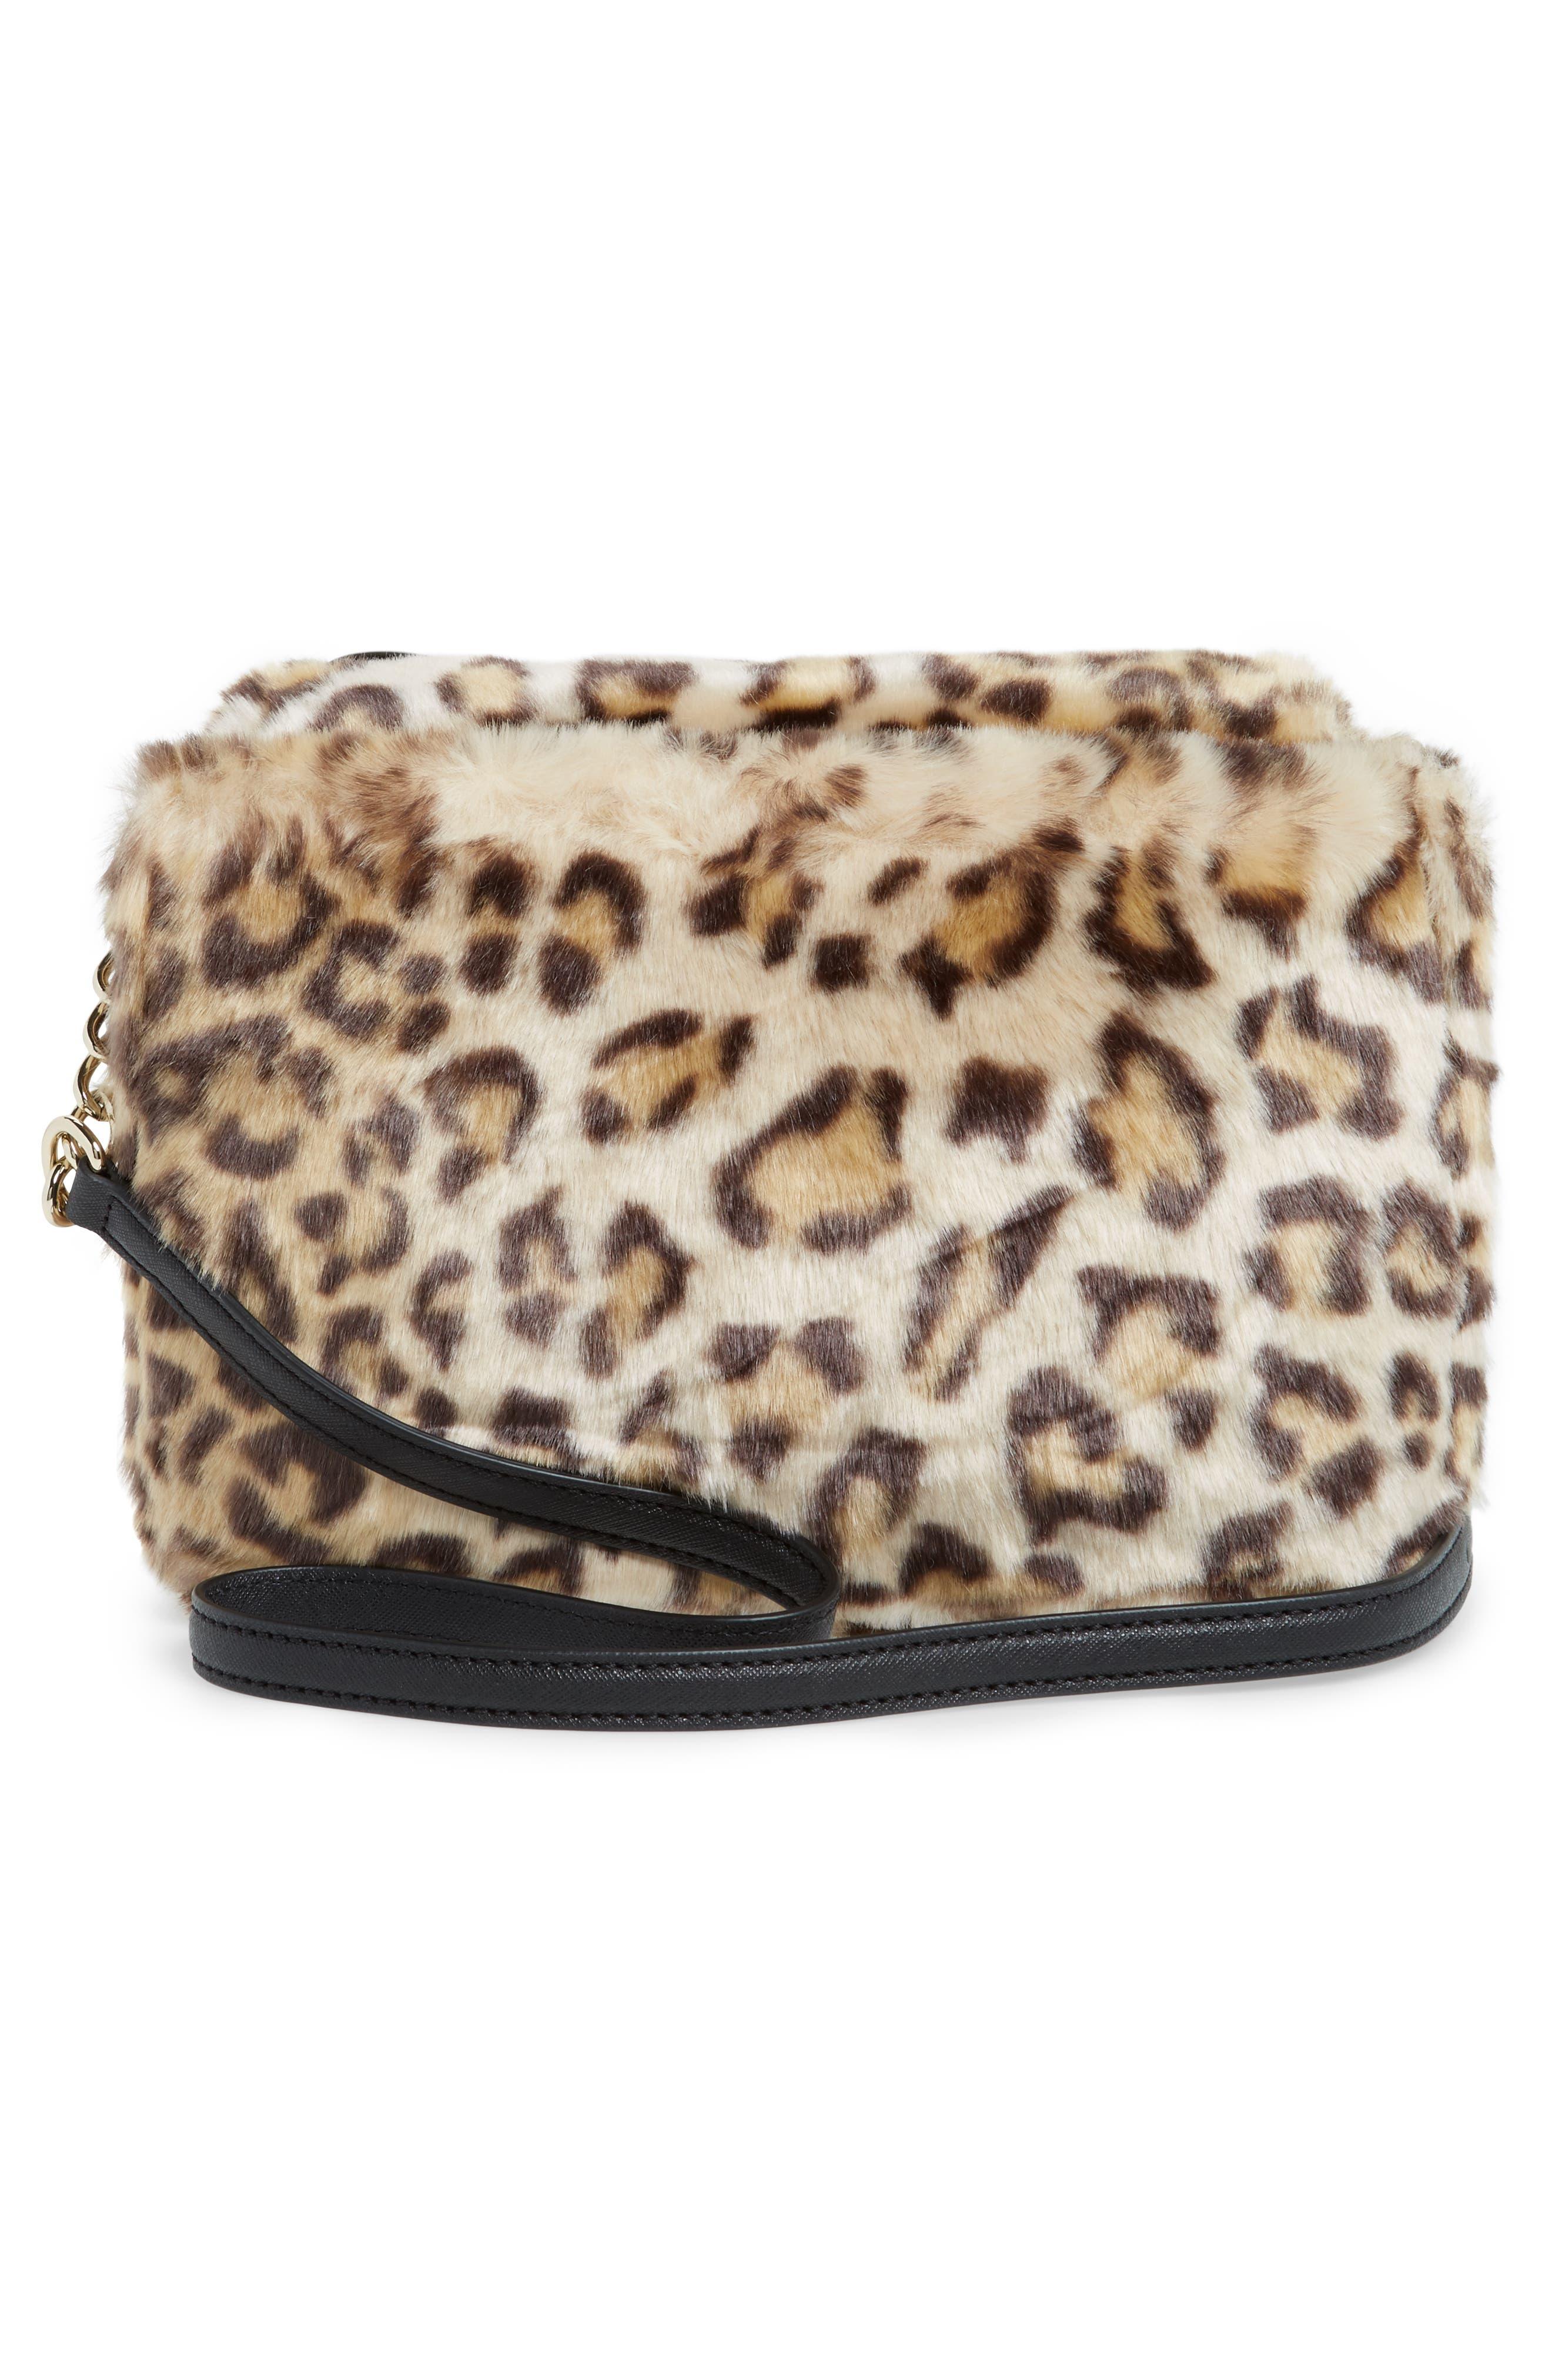 run wild faux fur shoulder bag/muff,                             Alternate thumbnail 3, color,                             200